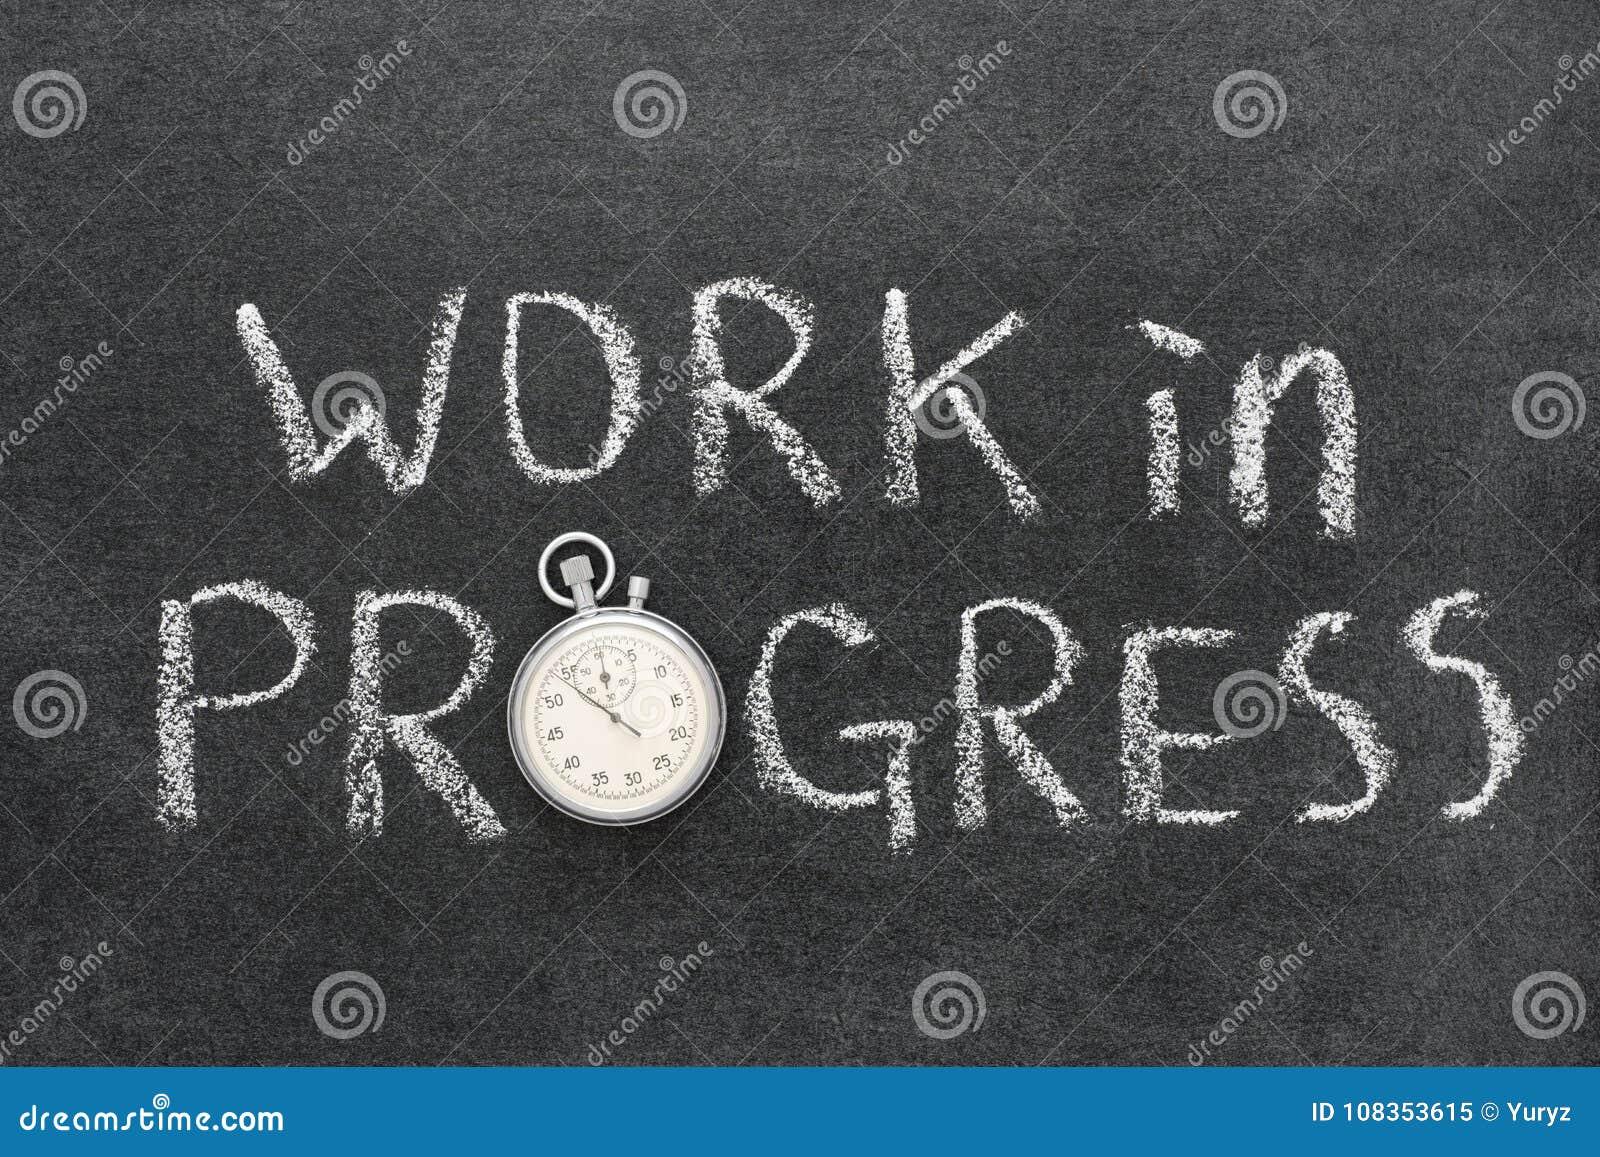 Download Work in progress stock image. Image of clock, action - 108353615